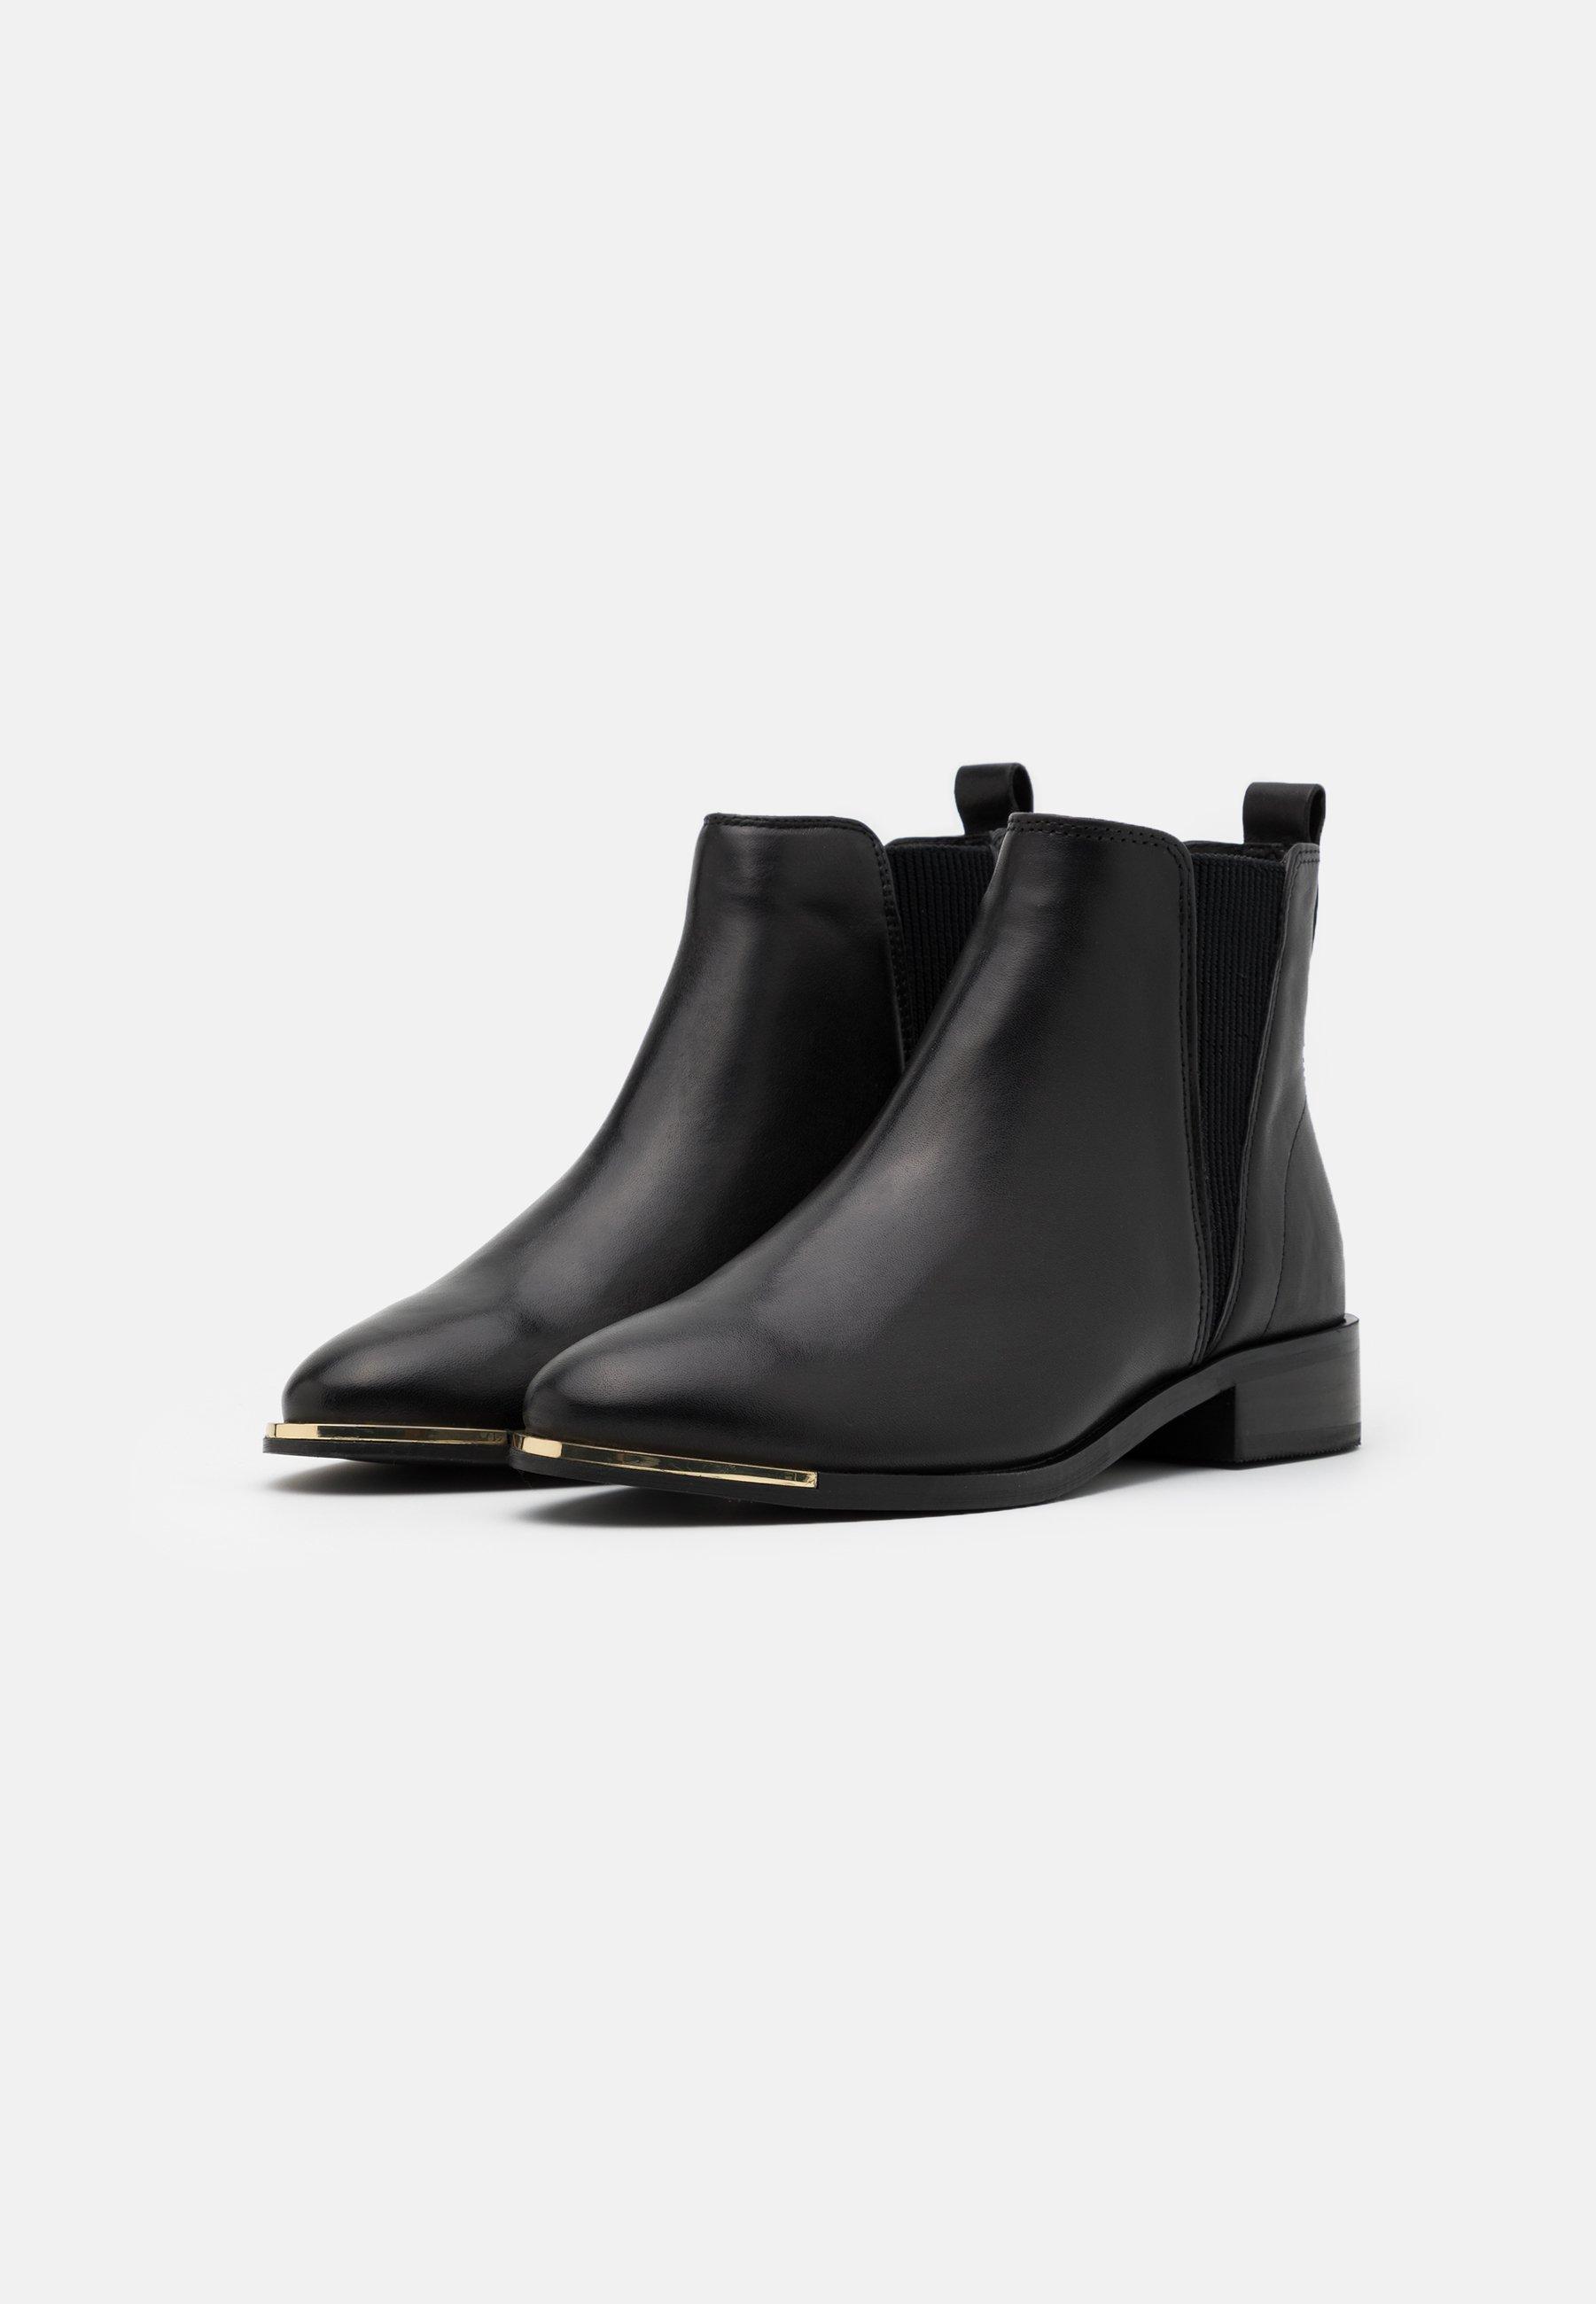 River Island Ankle Boot - Black/schwarz